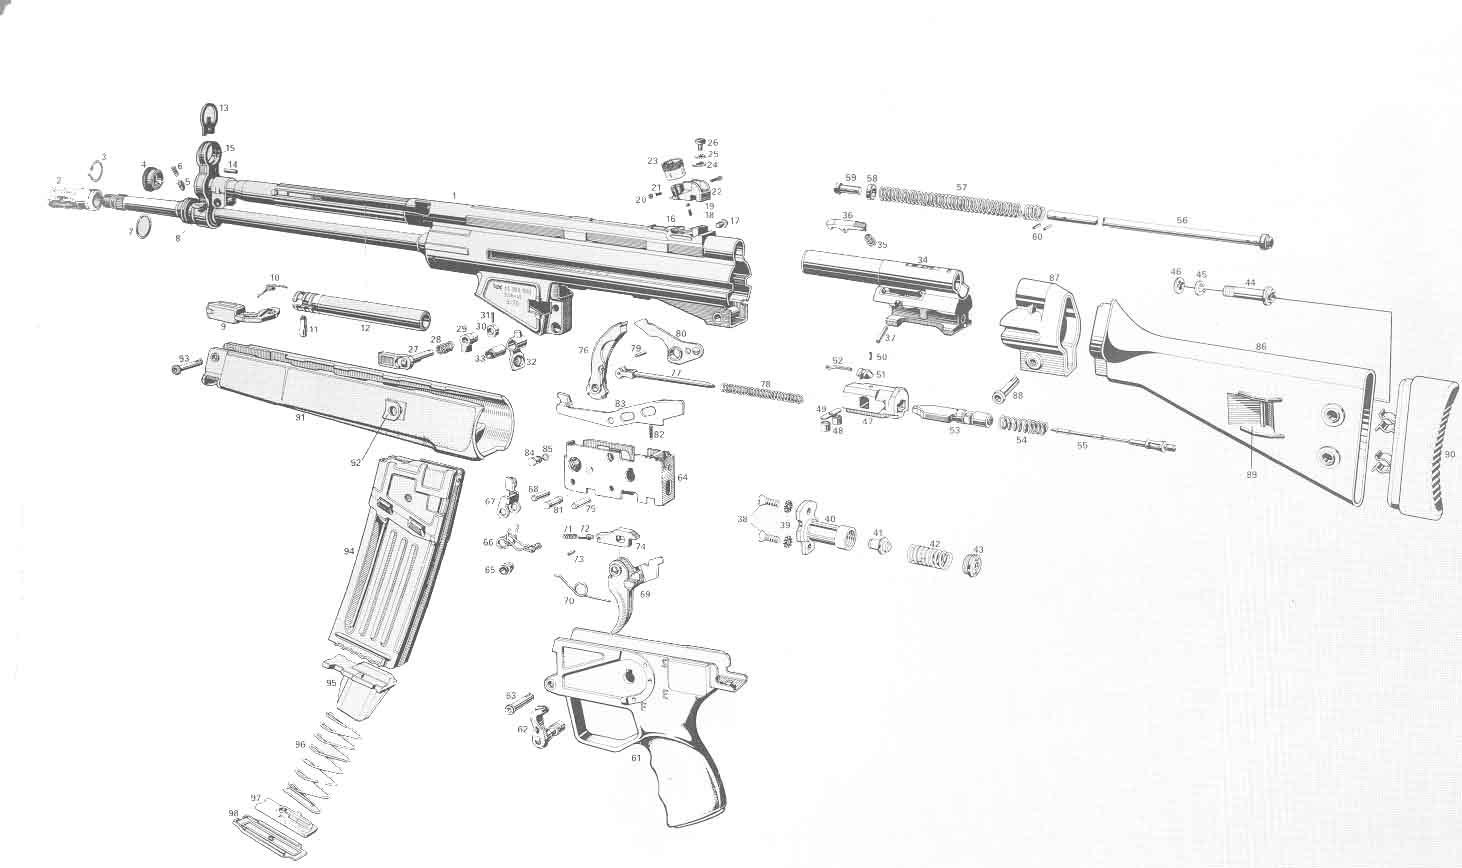 Heckler Amp Koch Hk53 Hk93 Hk33 Hk C93 Rifle Parts Kits And